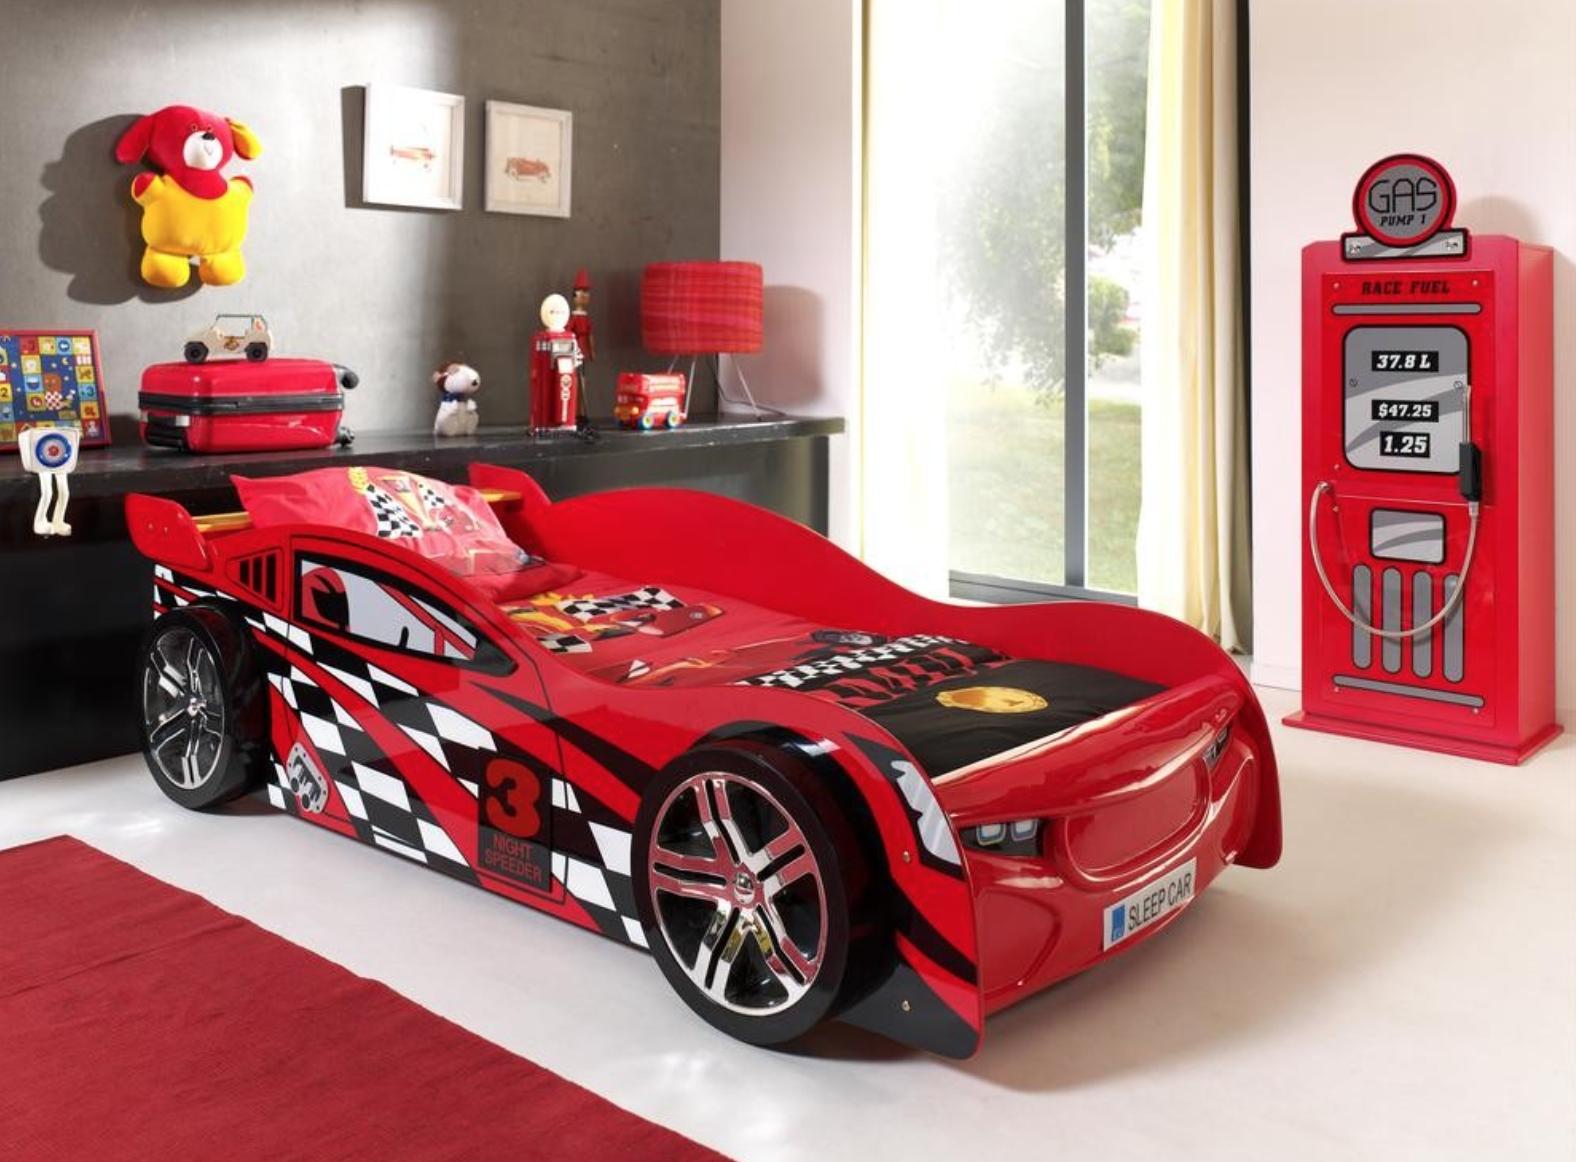 chambre gar on voiture rouge spider lumineux mod le sans led. Black Bedroom Furniture Sets. Home Design Ideas